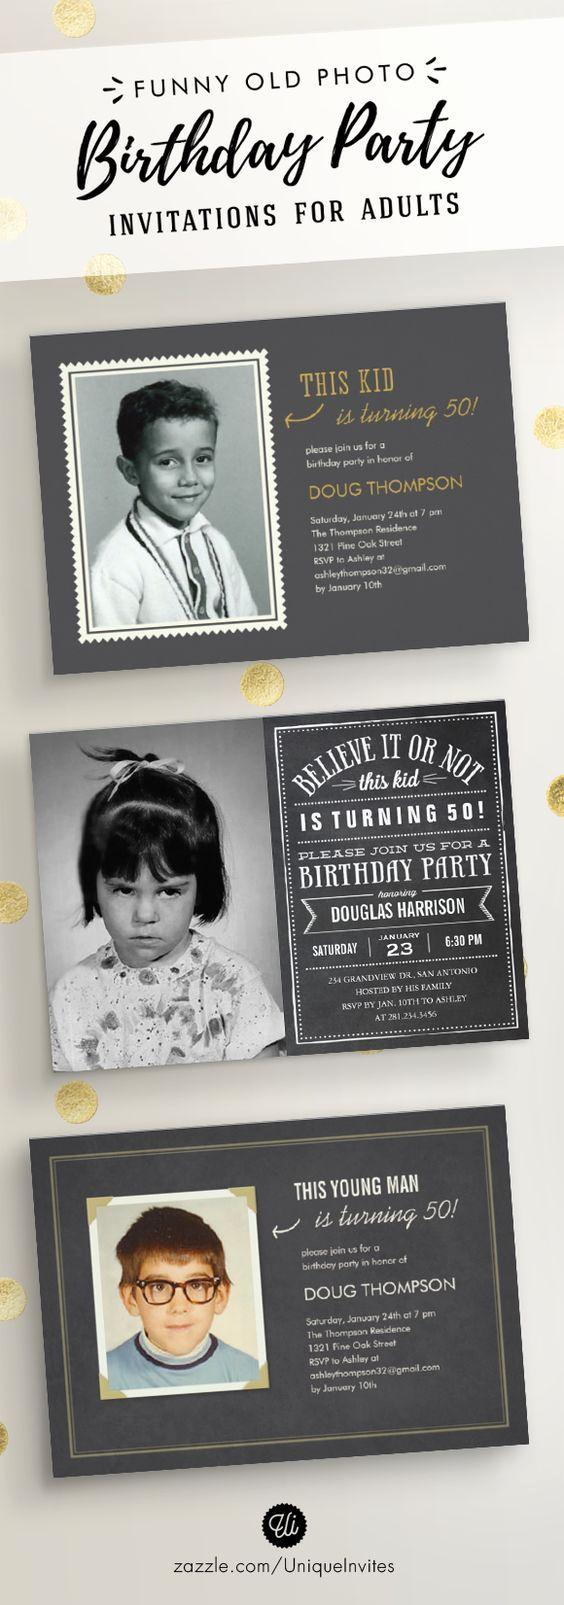 70th Birthday Invitation Ideas Inspirational Best 25 70th Birthday Invitations Ideas On Pinterest